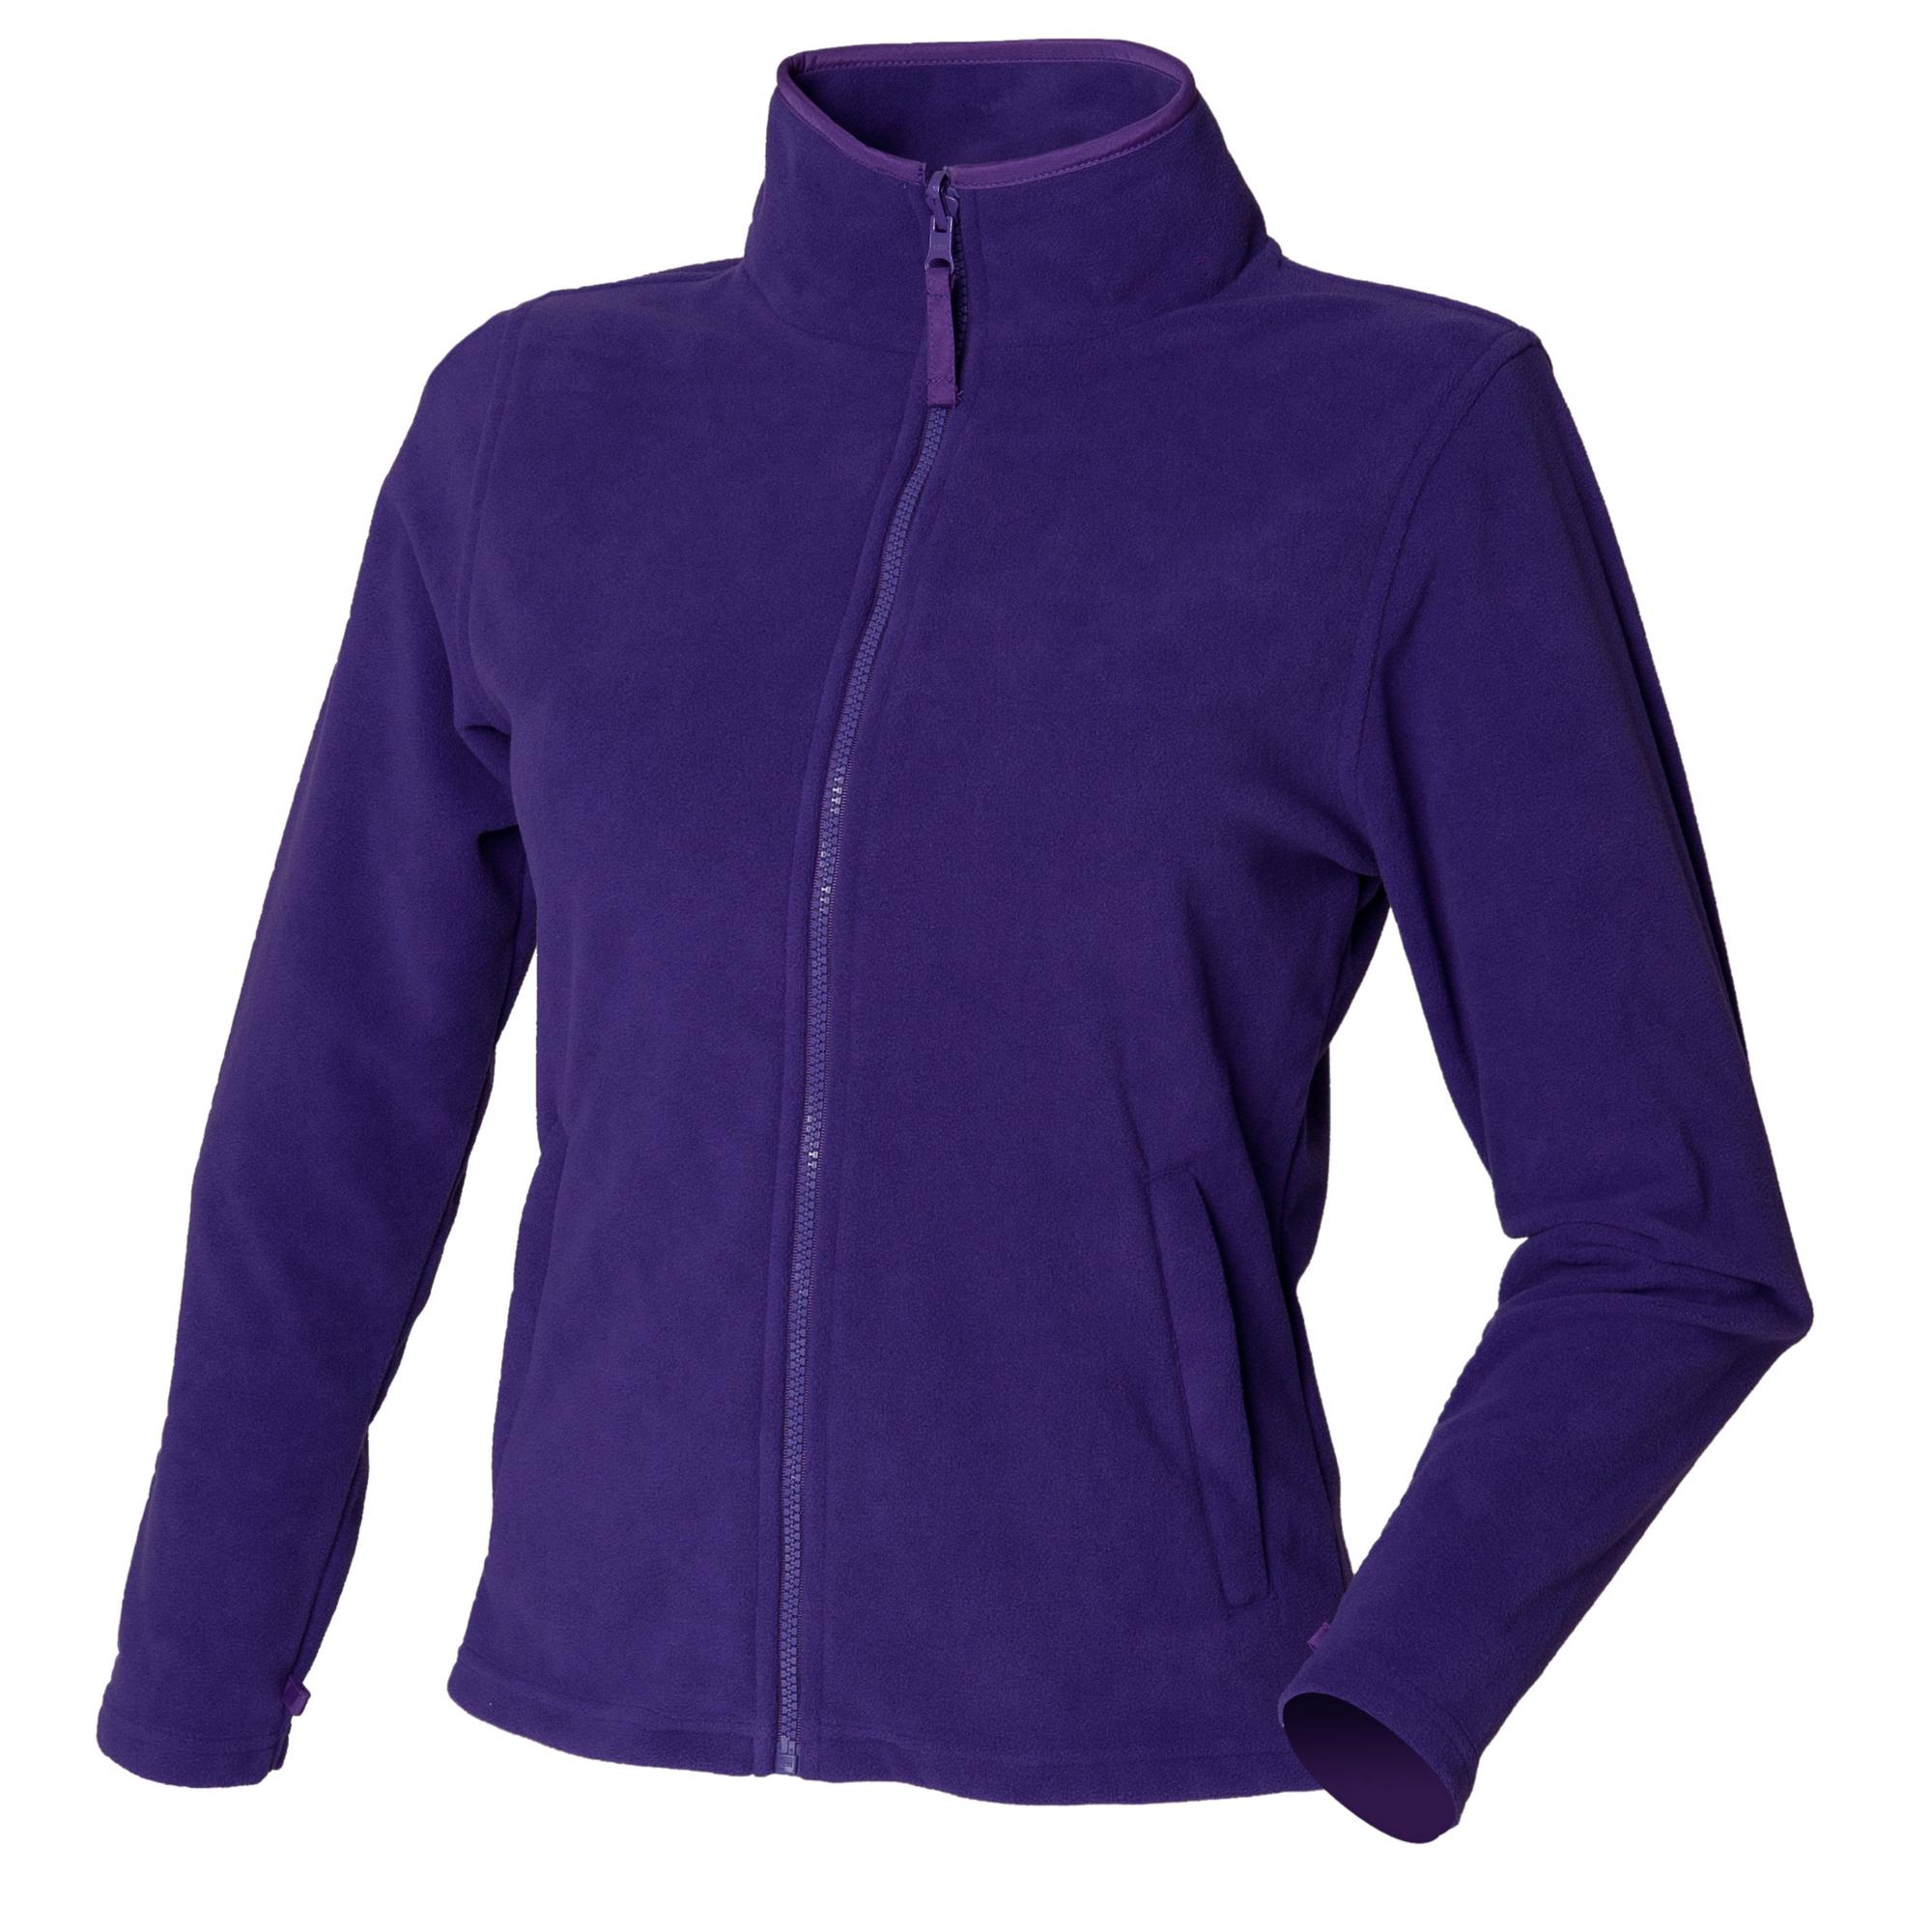 Henbury Womens/Ladies Microfleece Anti-Pill Jacket (S) (Purple)